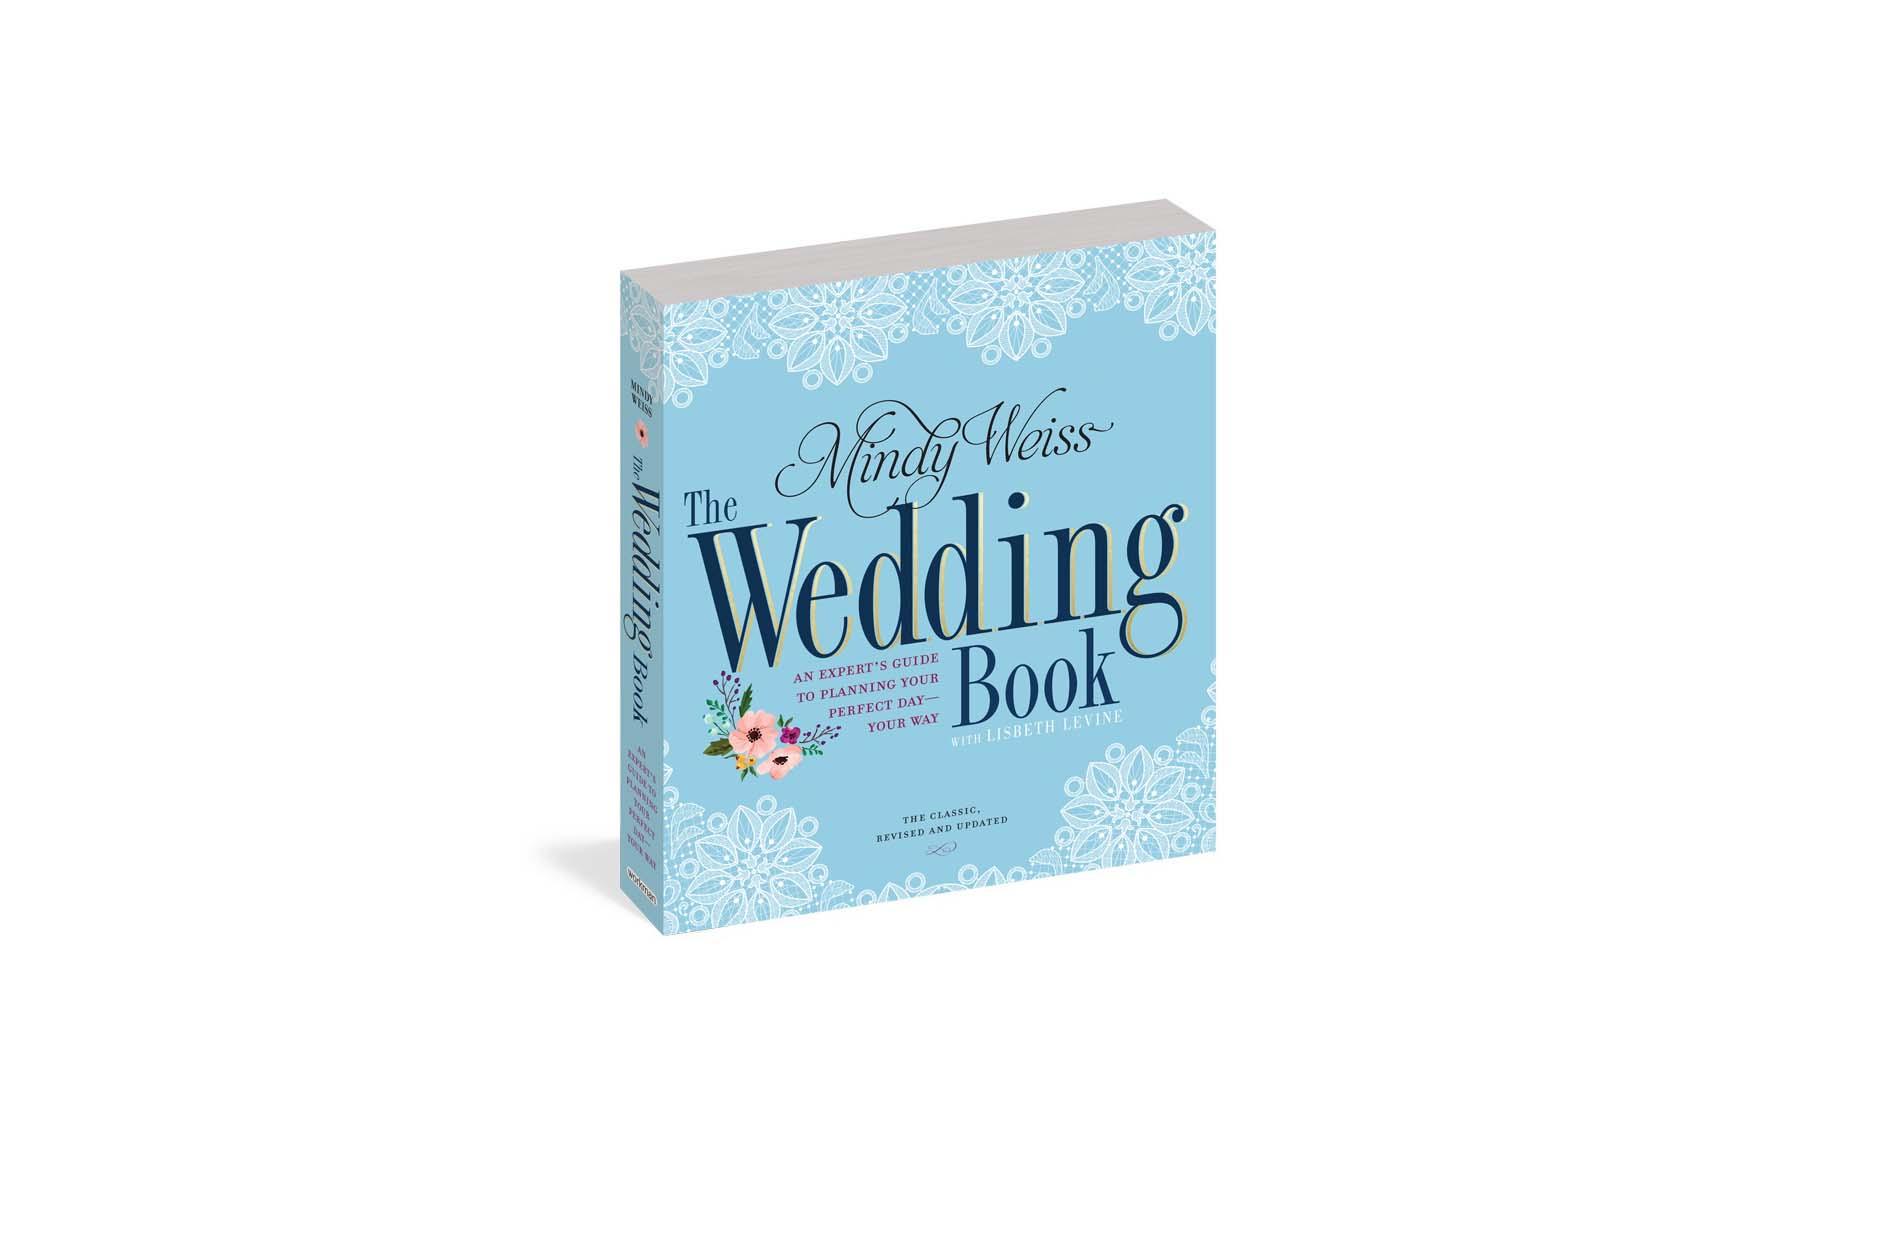 mindy-weiss-wedding-book-0916